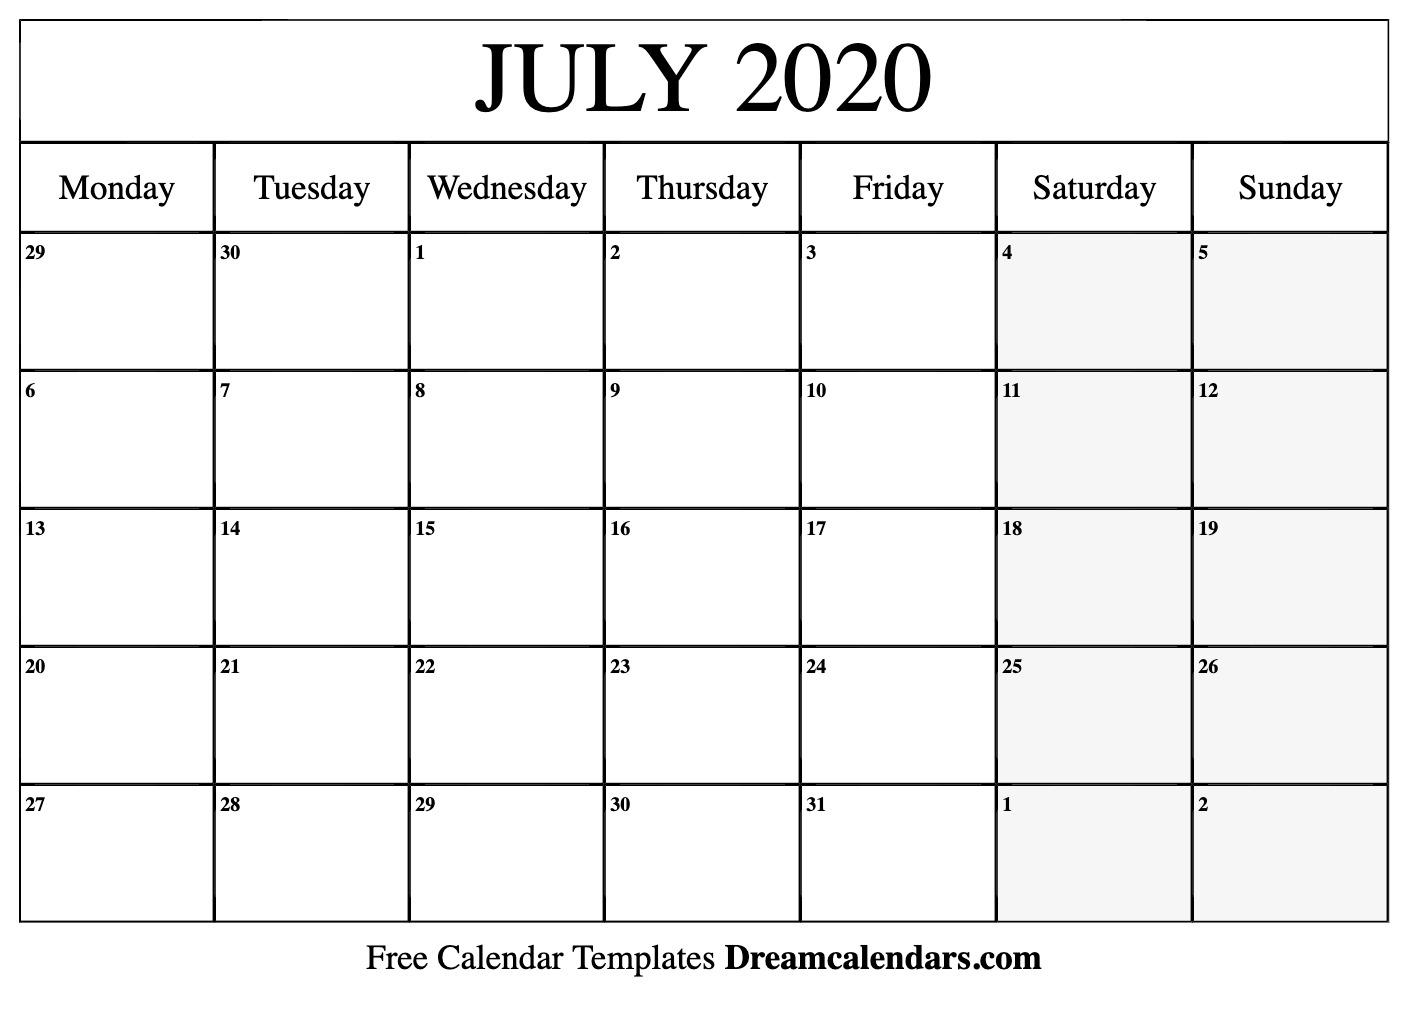 July 2020 Calendar | Free Blank Printable Templates